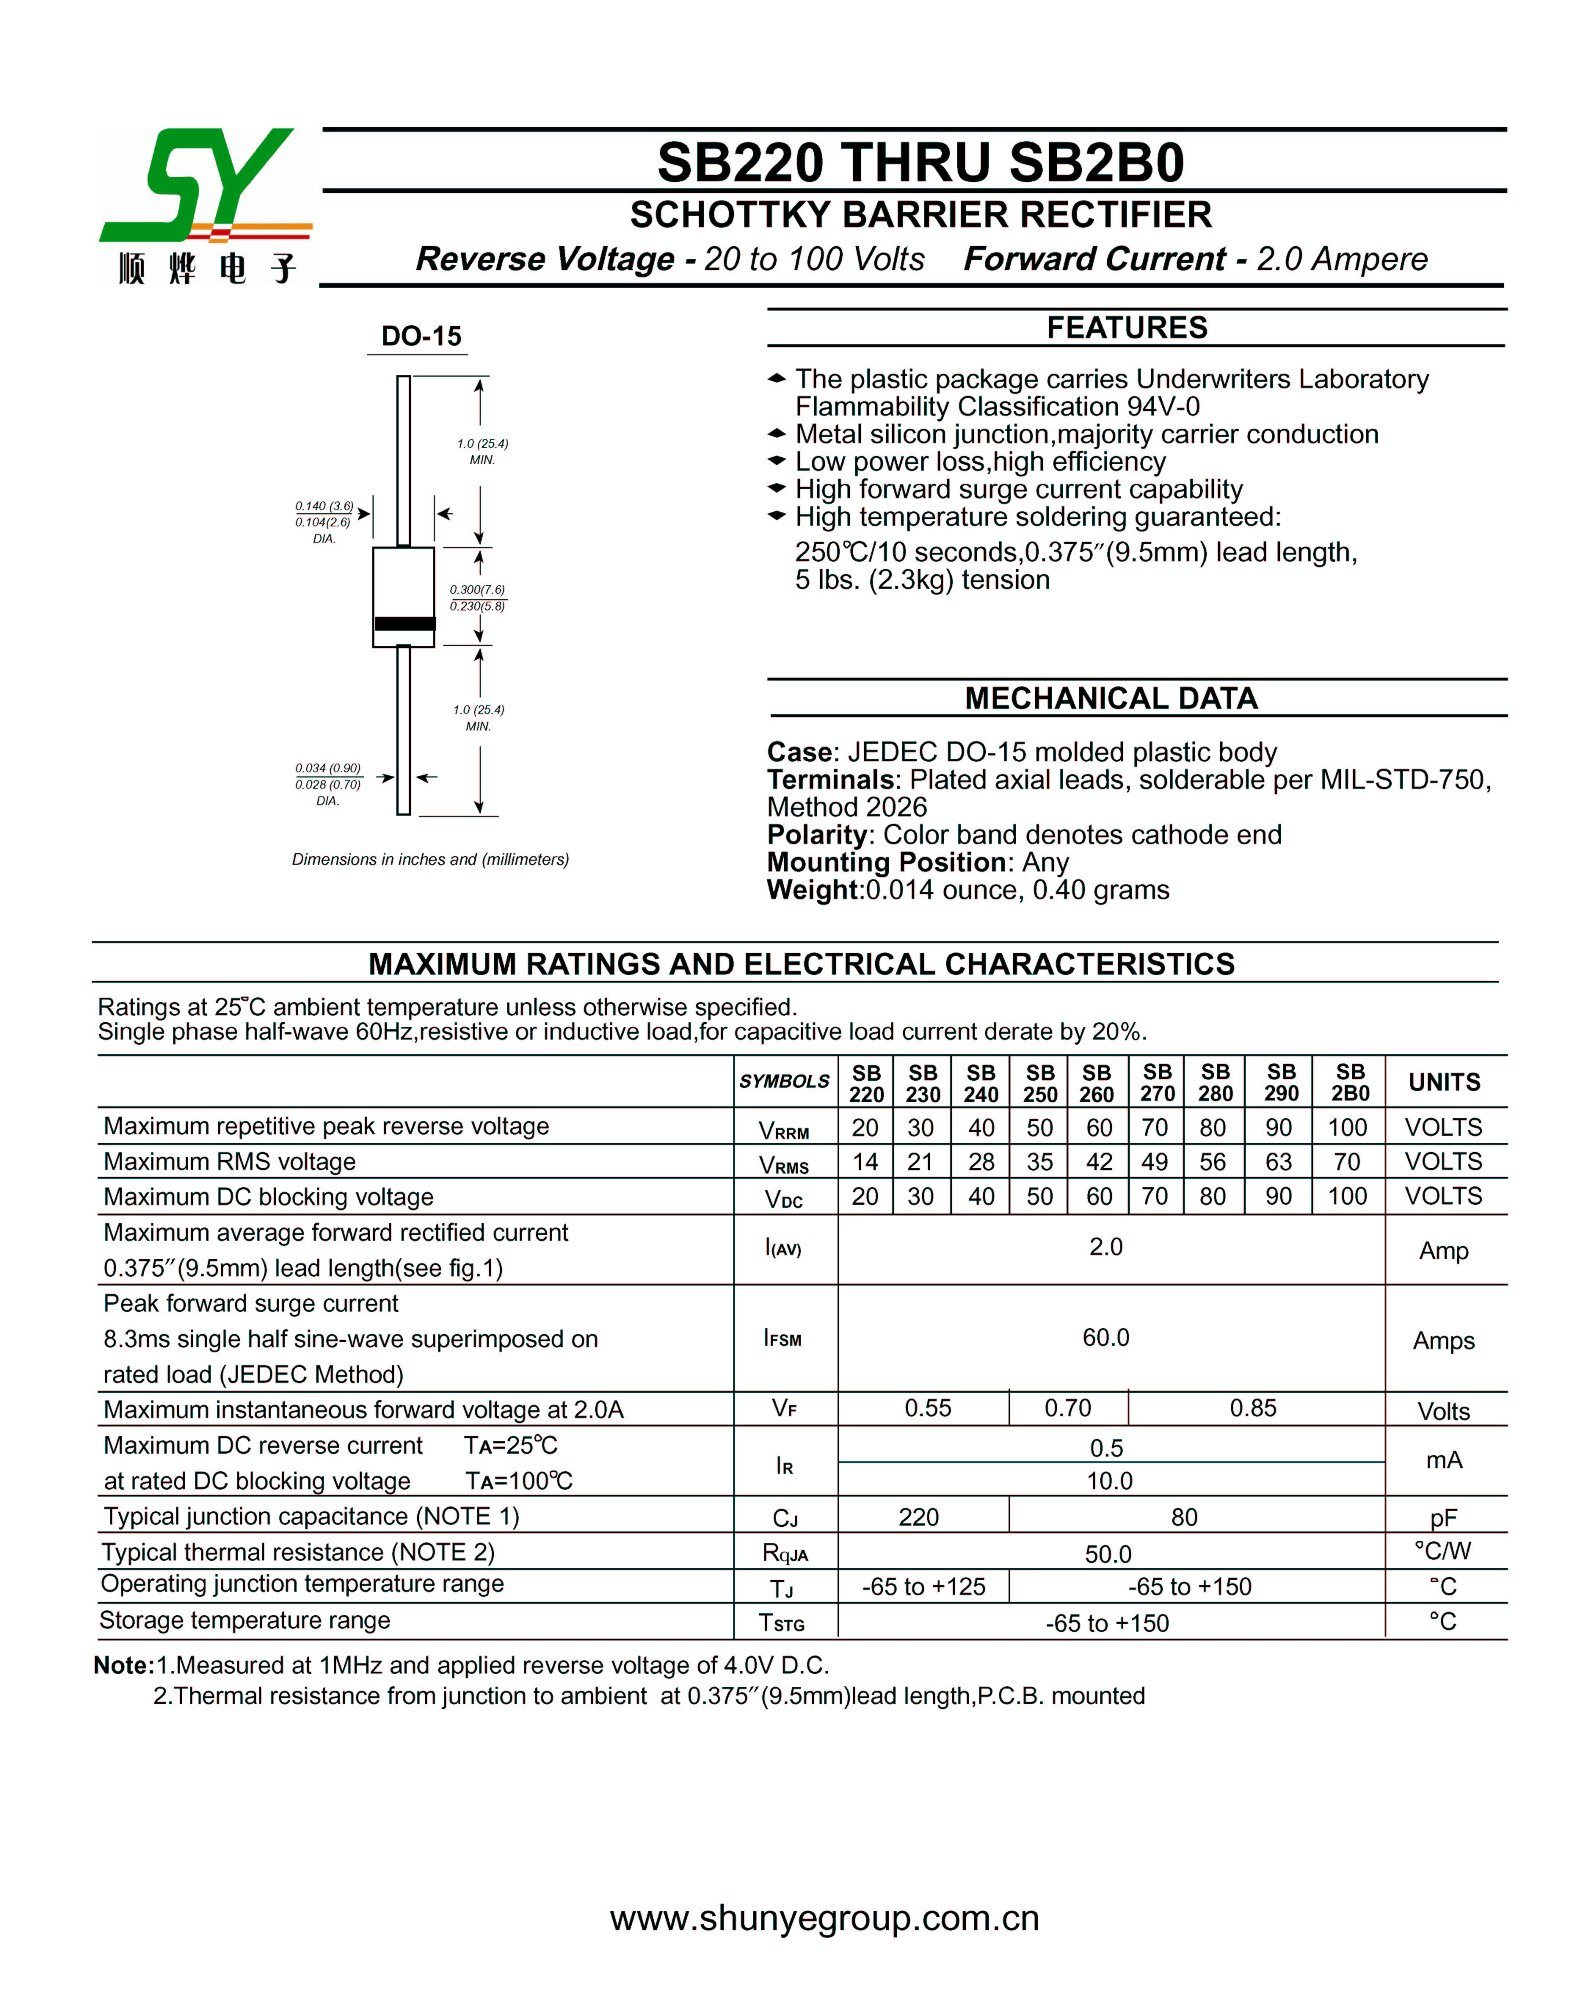 Sb220-sb260-schottky diode-产品页标题 en.